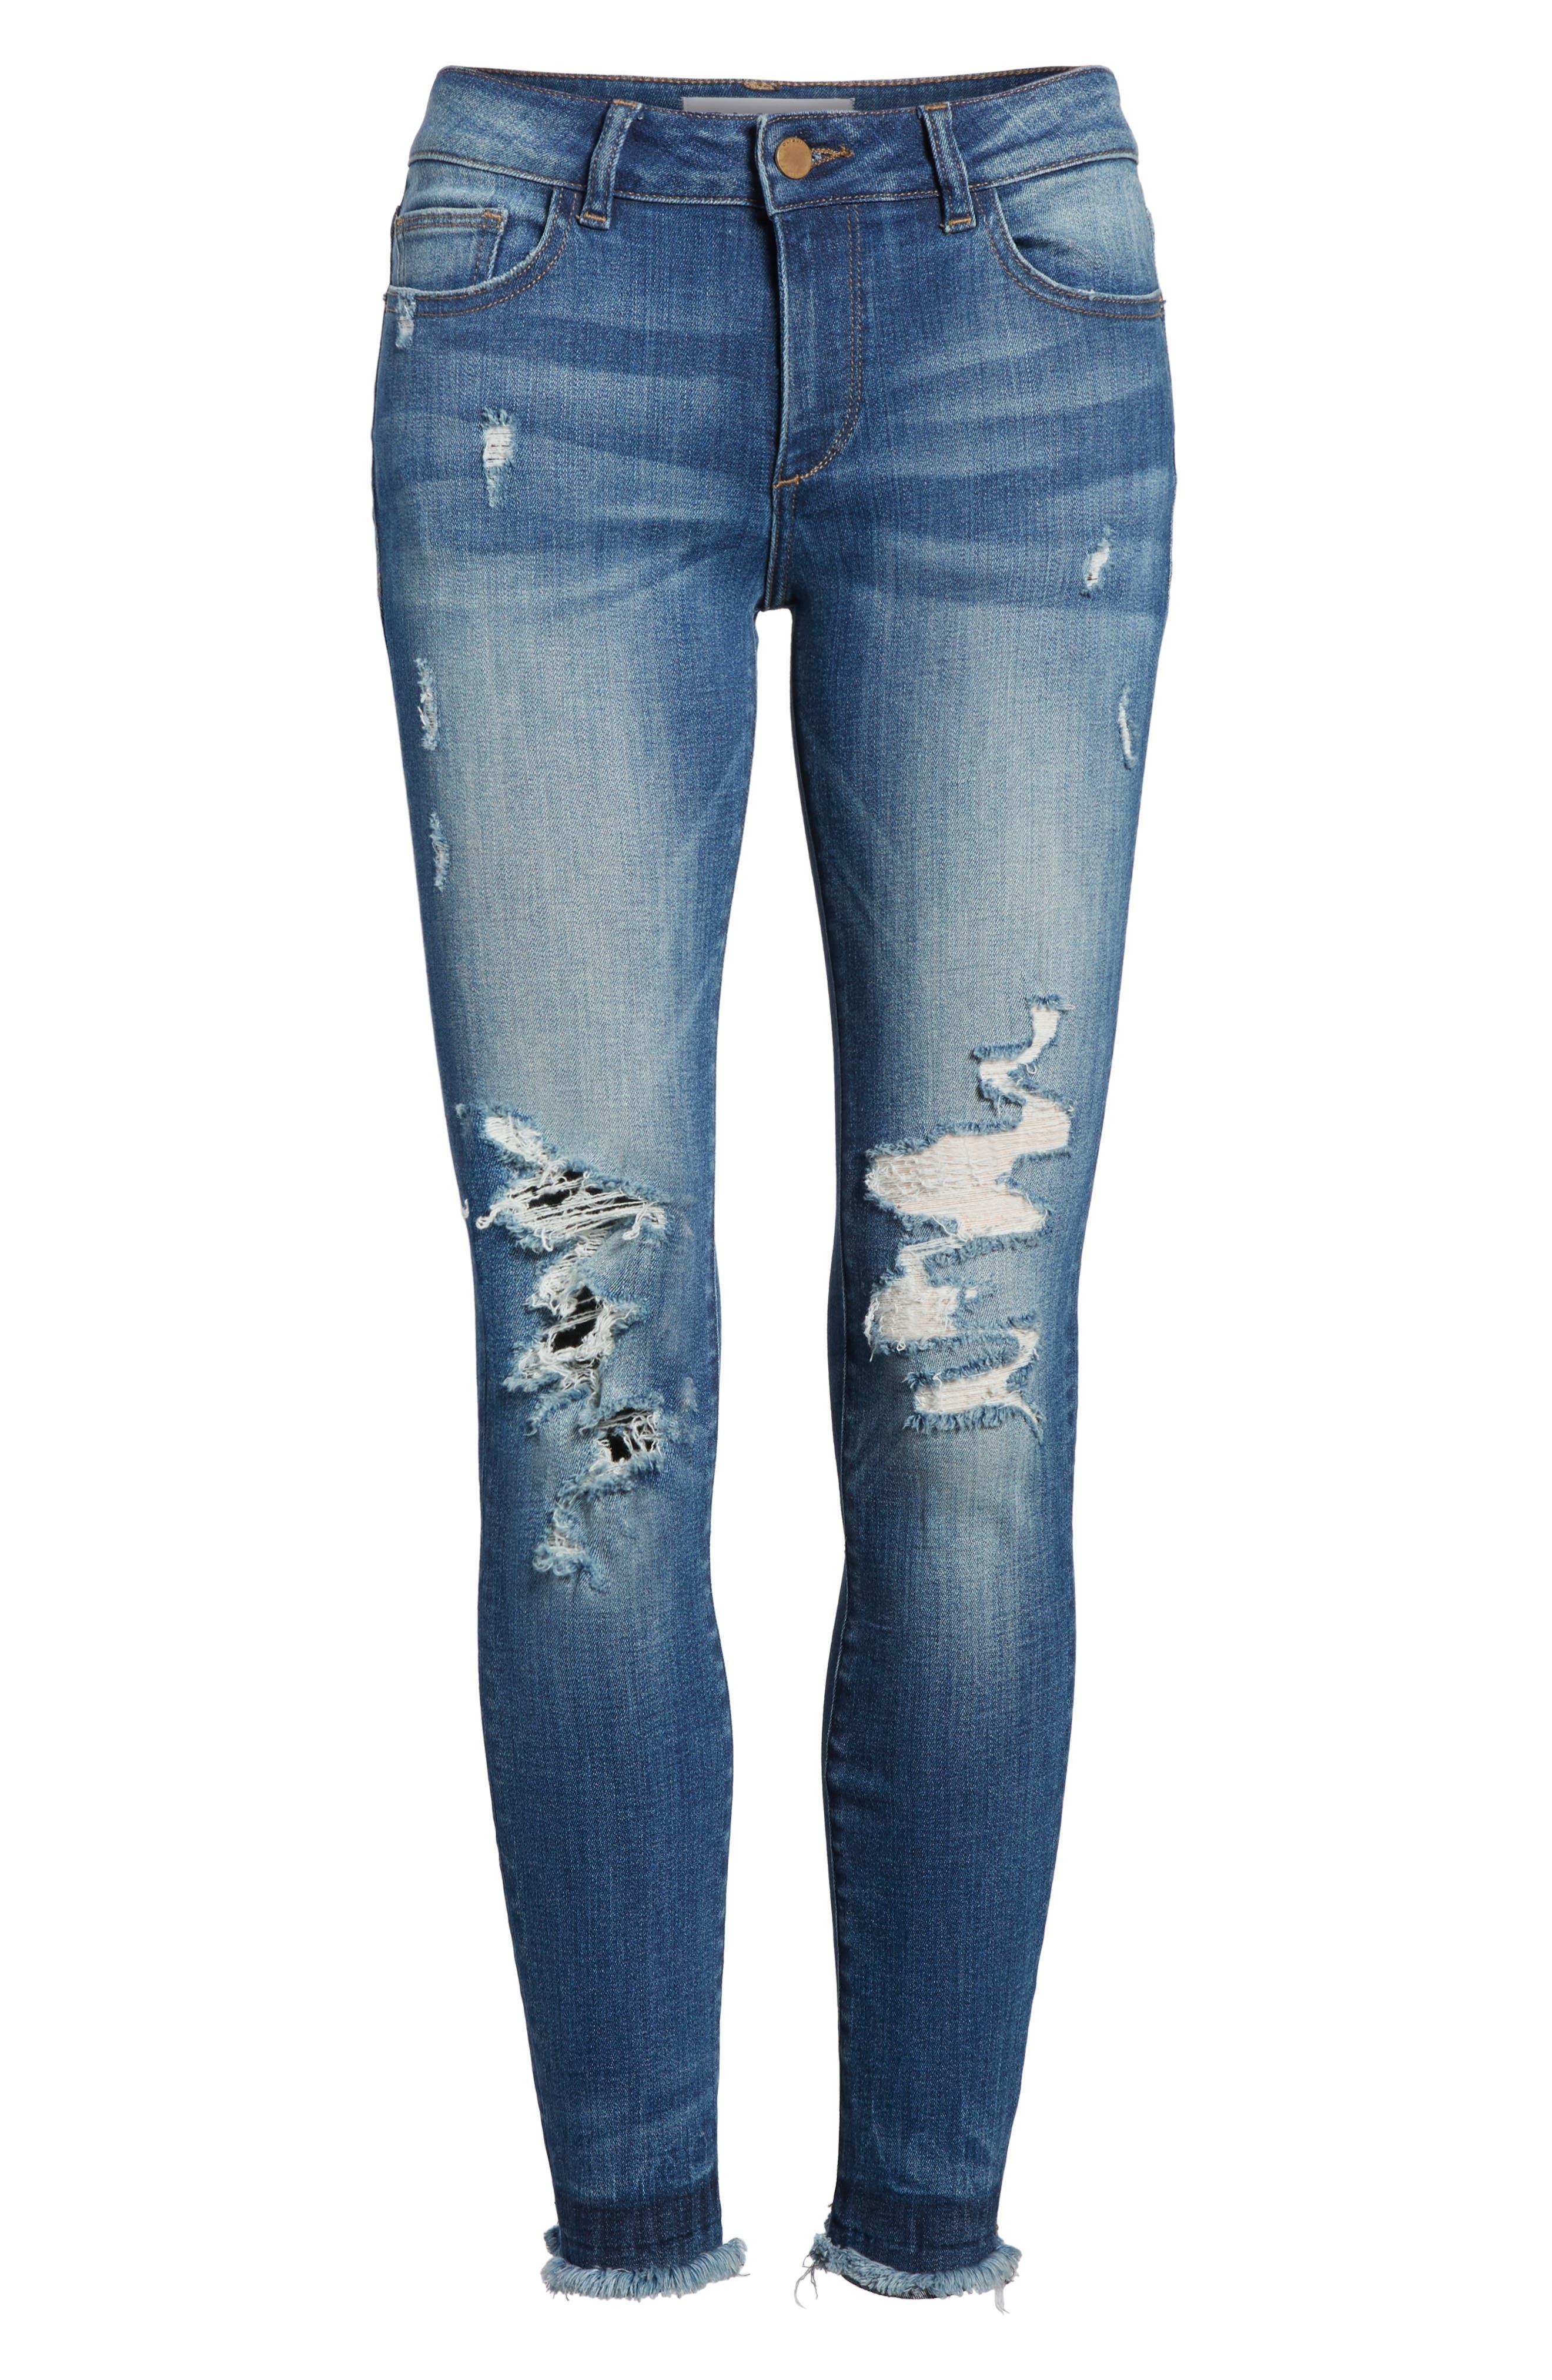 Emma Power Legging Jeans,                             Alternate thumbnail 6, color,                             Westwood